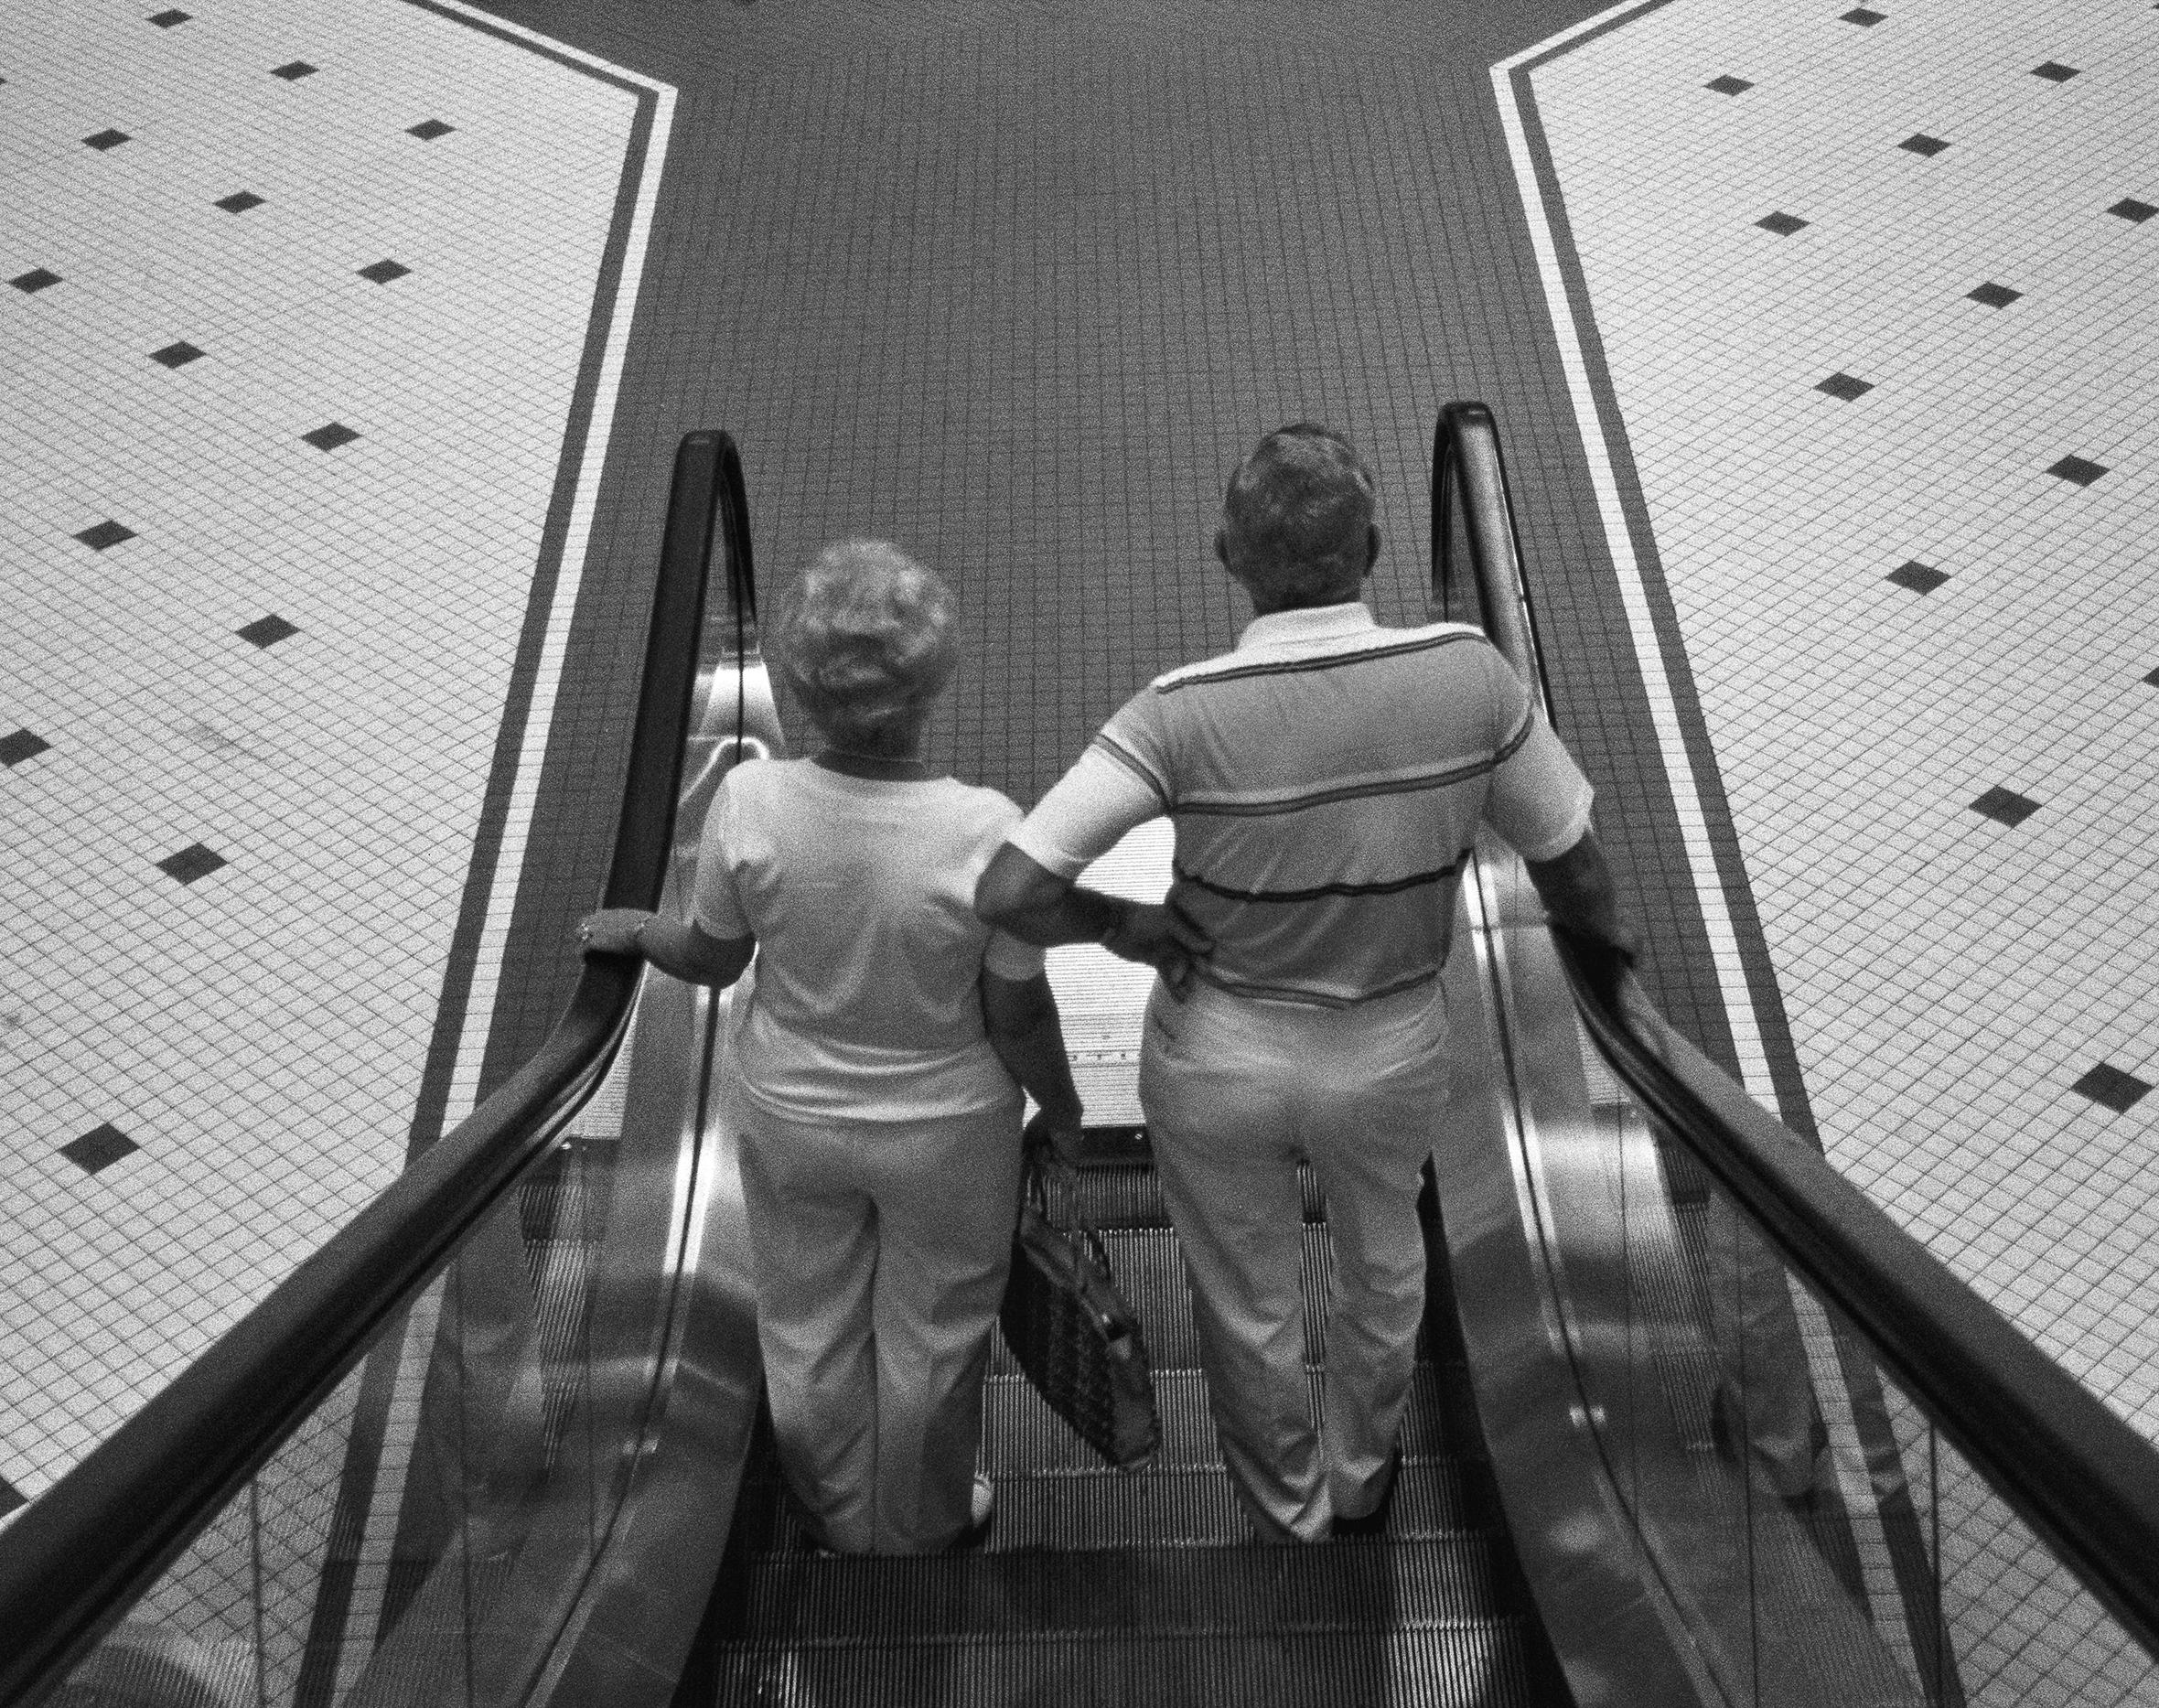 527 - Galinsky - The Mall